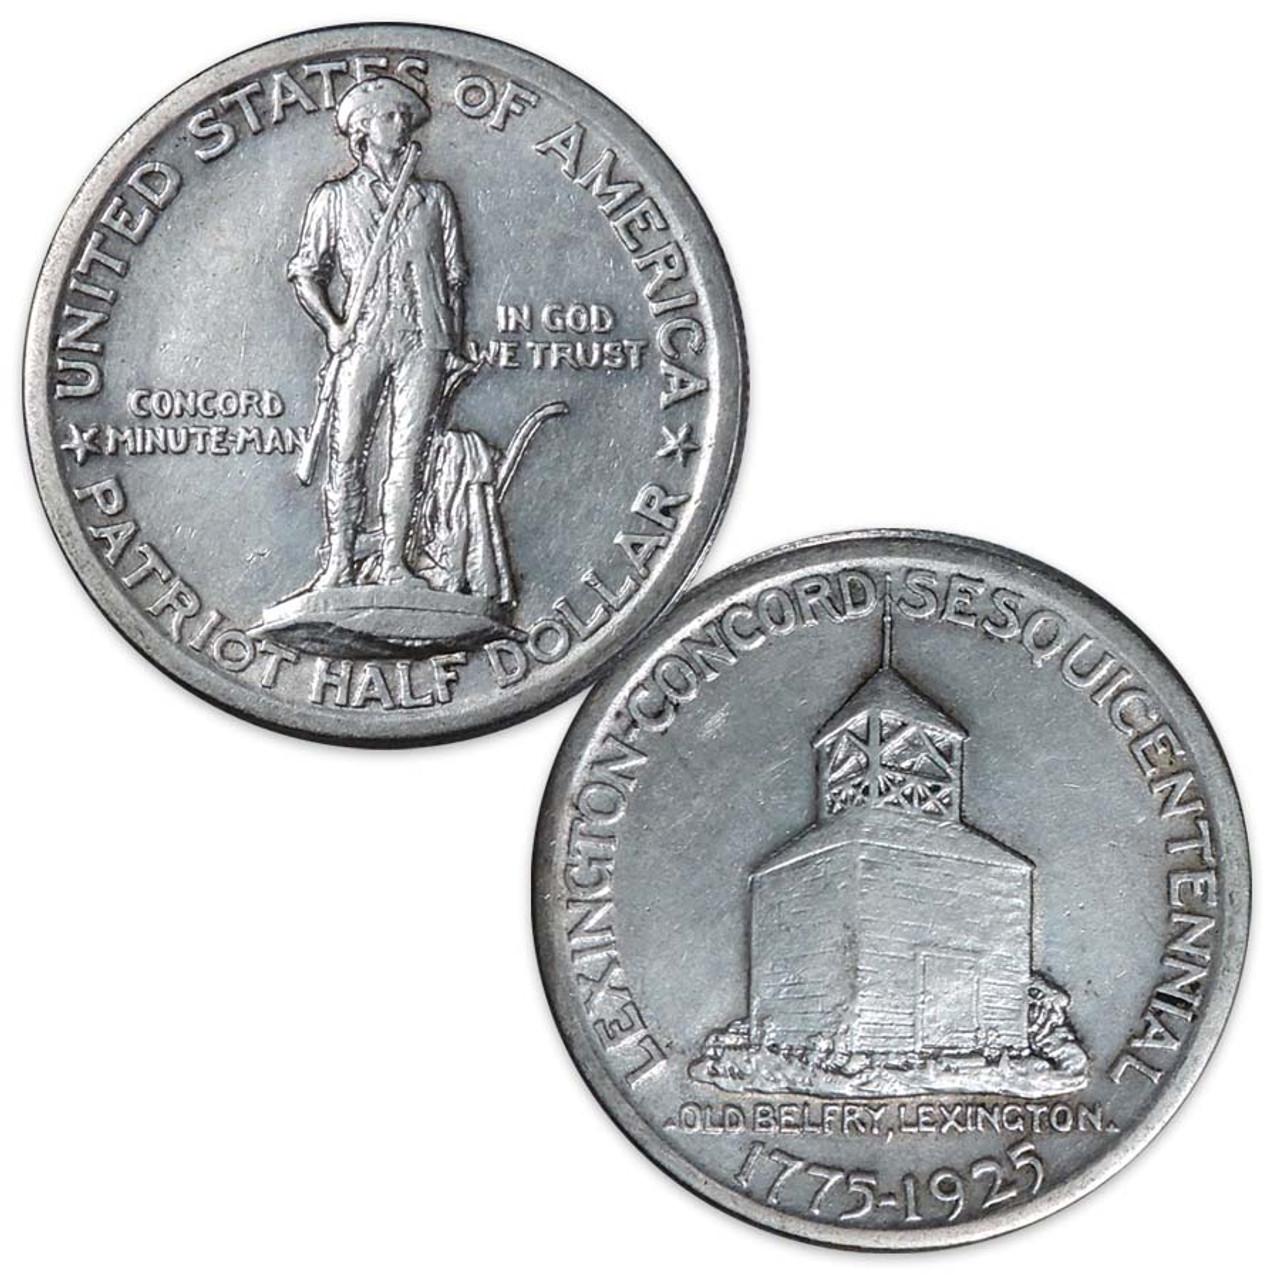 U.S. 1925 Lexington-Concord Sesquicentennial Silver Half Dollar, Extra Fine